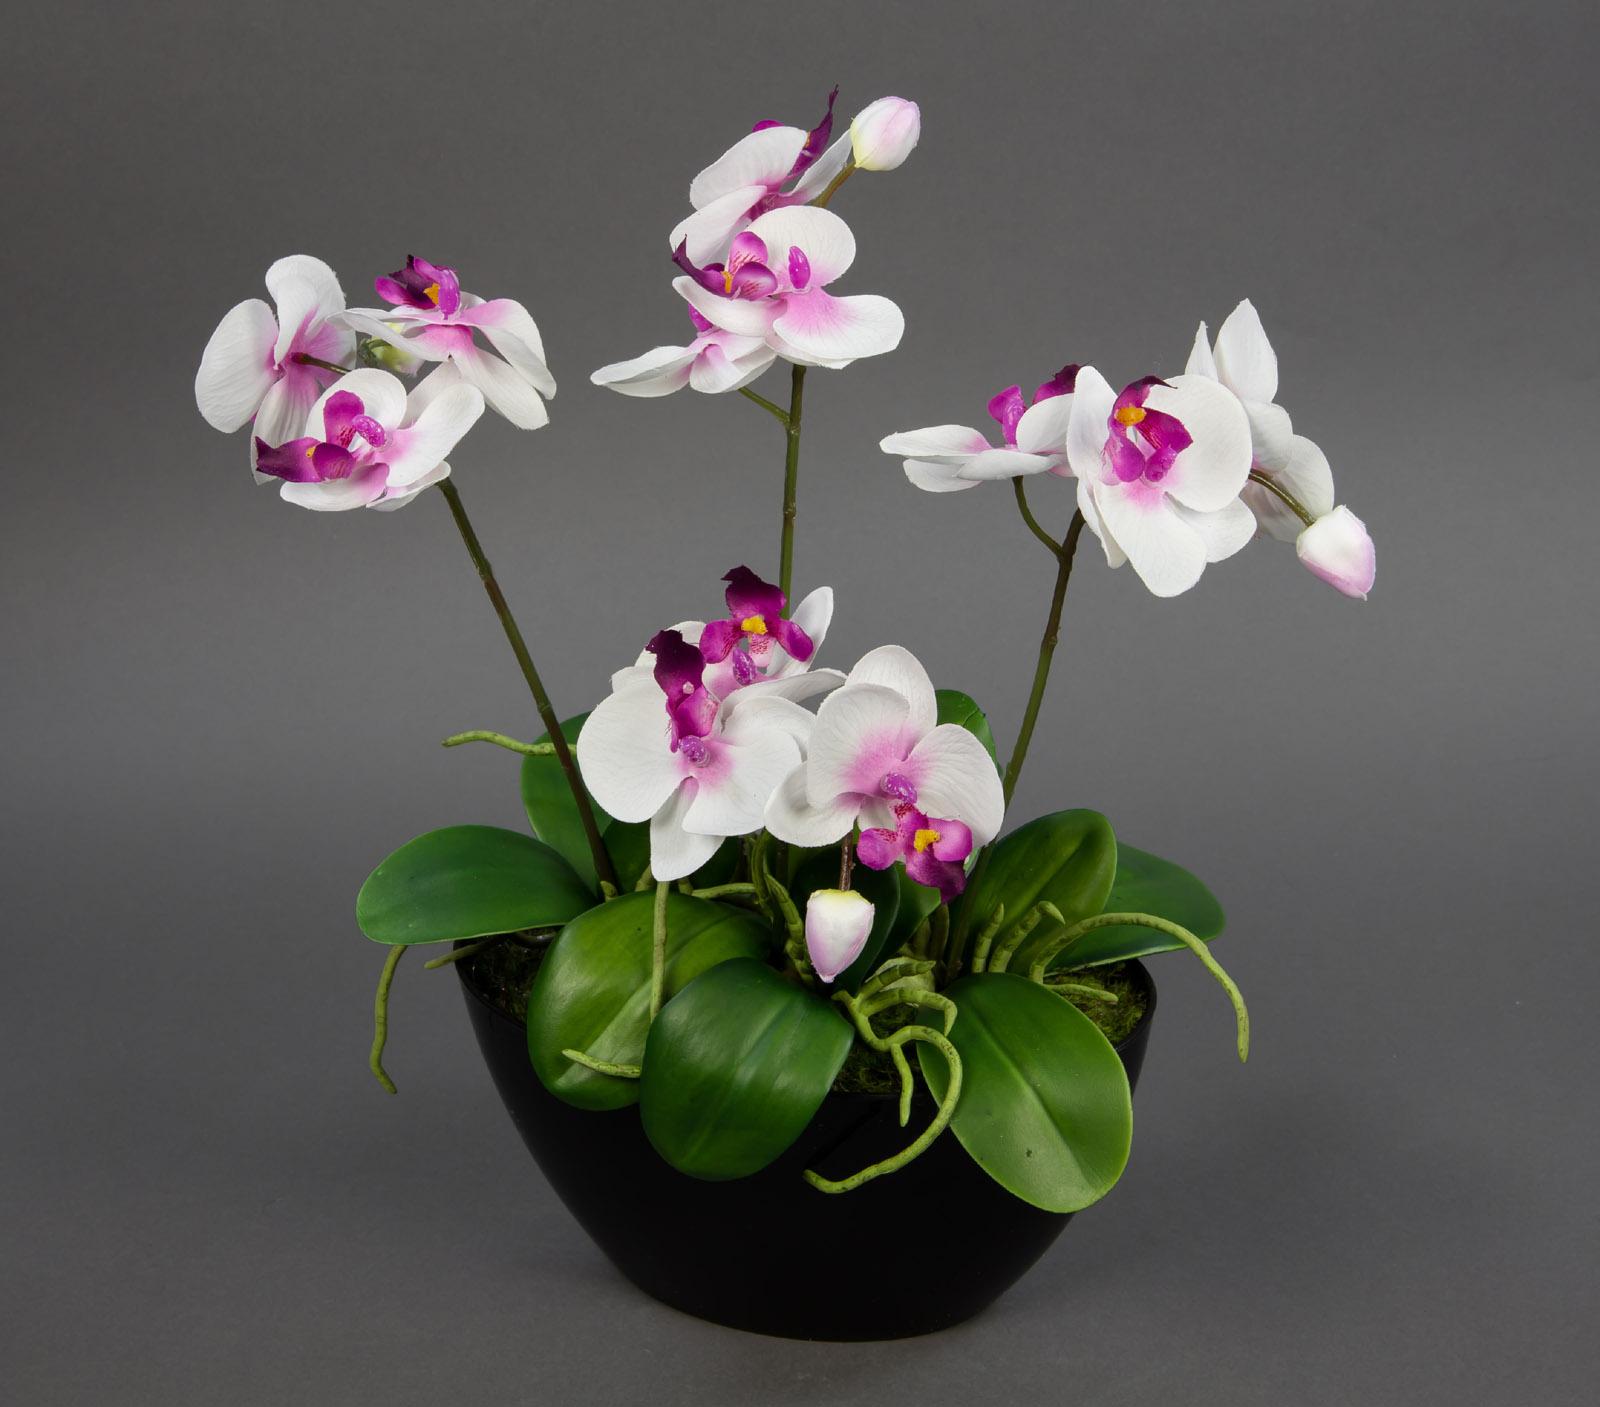 Orchideen arrangement 38x36cm wei pink in schwarzer dekoschale ga kunstblumen ebay - Orchideen arrangement ...